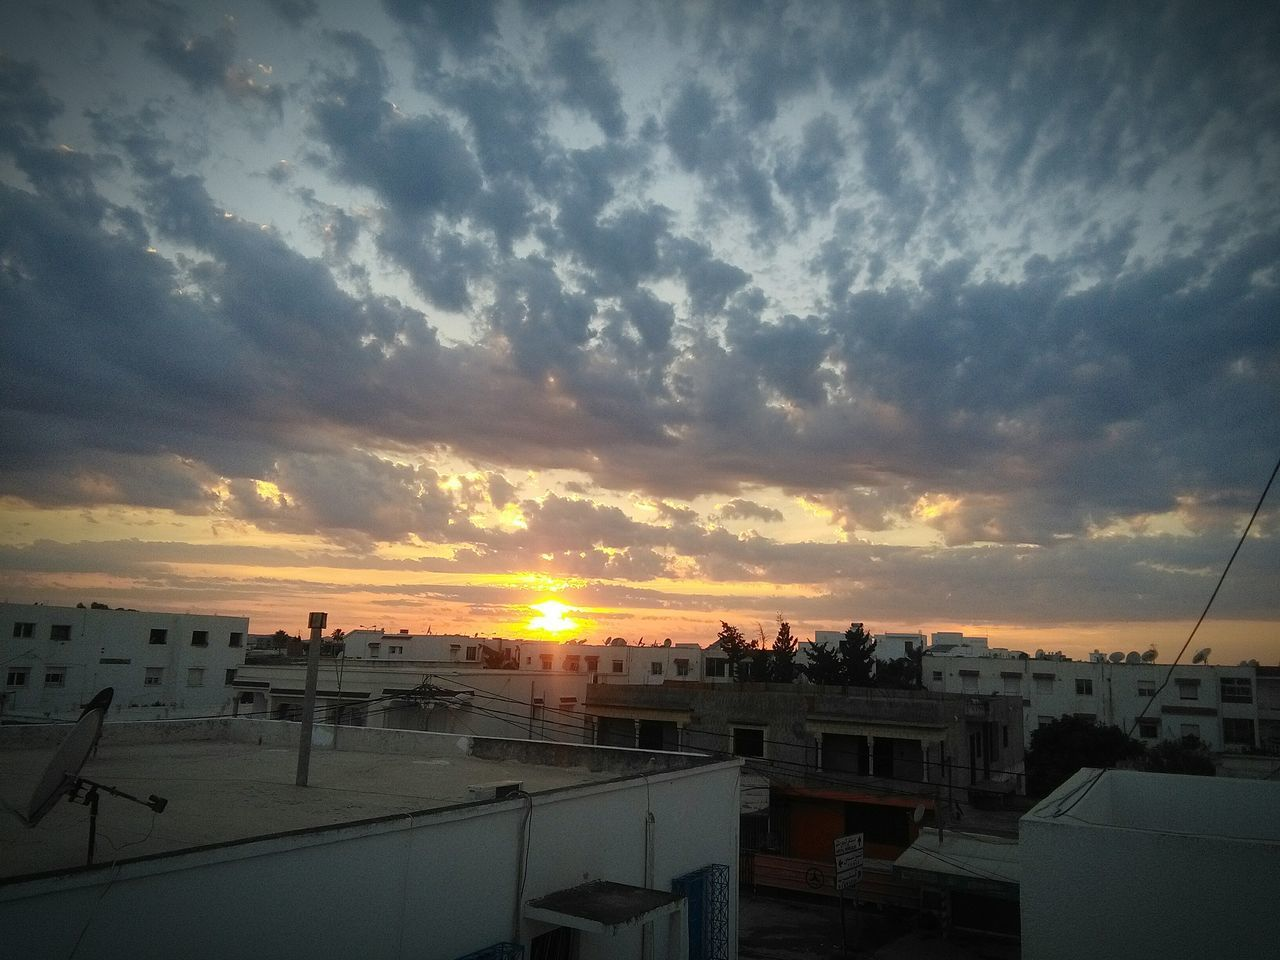 Relaxing سبحانك ربي سُبْحَانَ اللّه الغروب رمضان Sky And Clouds Soleil Couchant Sunset La Marsa